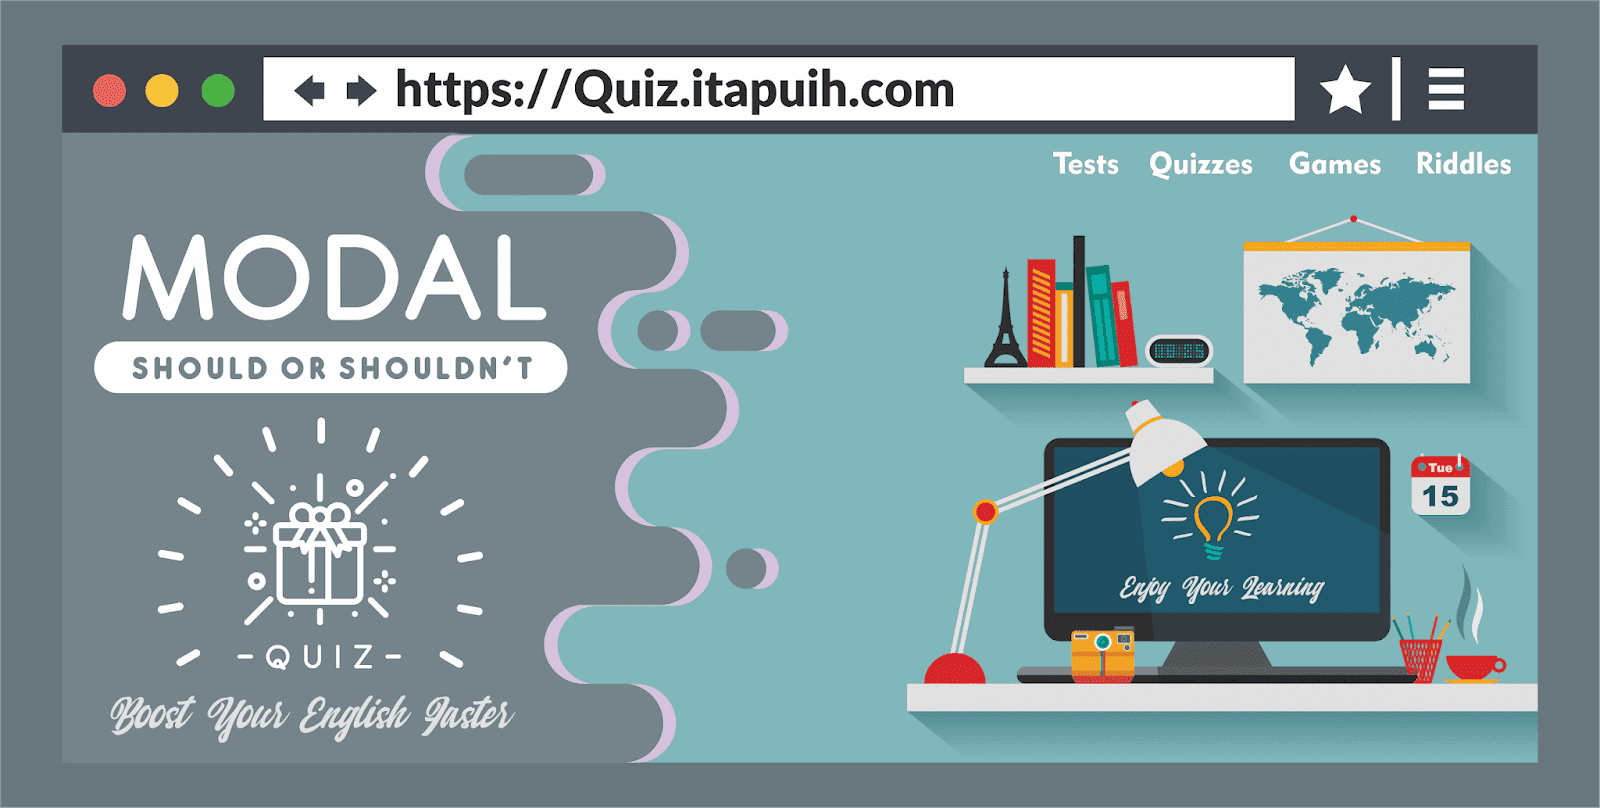 Quiz Itapuih Com 20 Soal Bahasa Inggris Should Or Shouldn T Dan Jaw Quizzes Games Quizzes Riddles